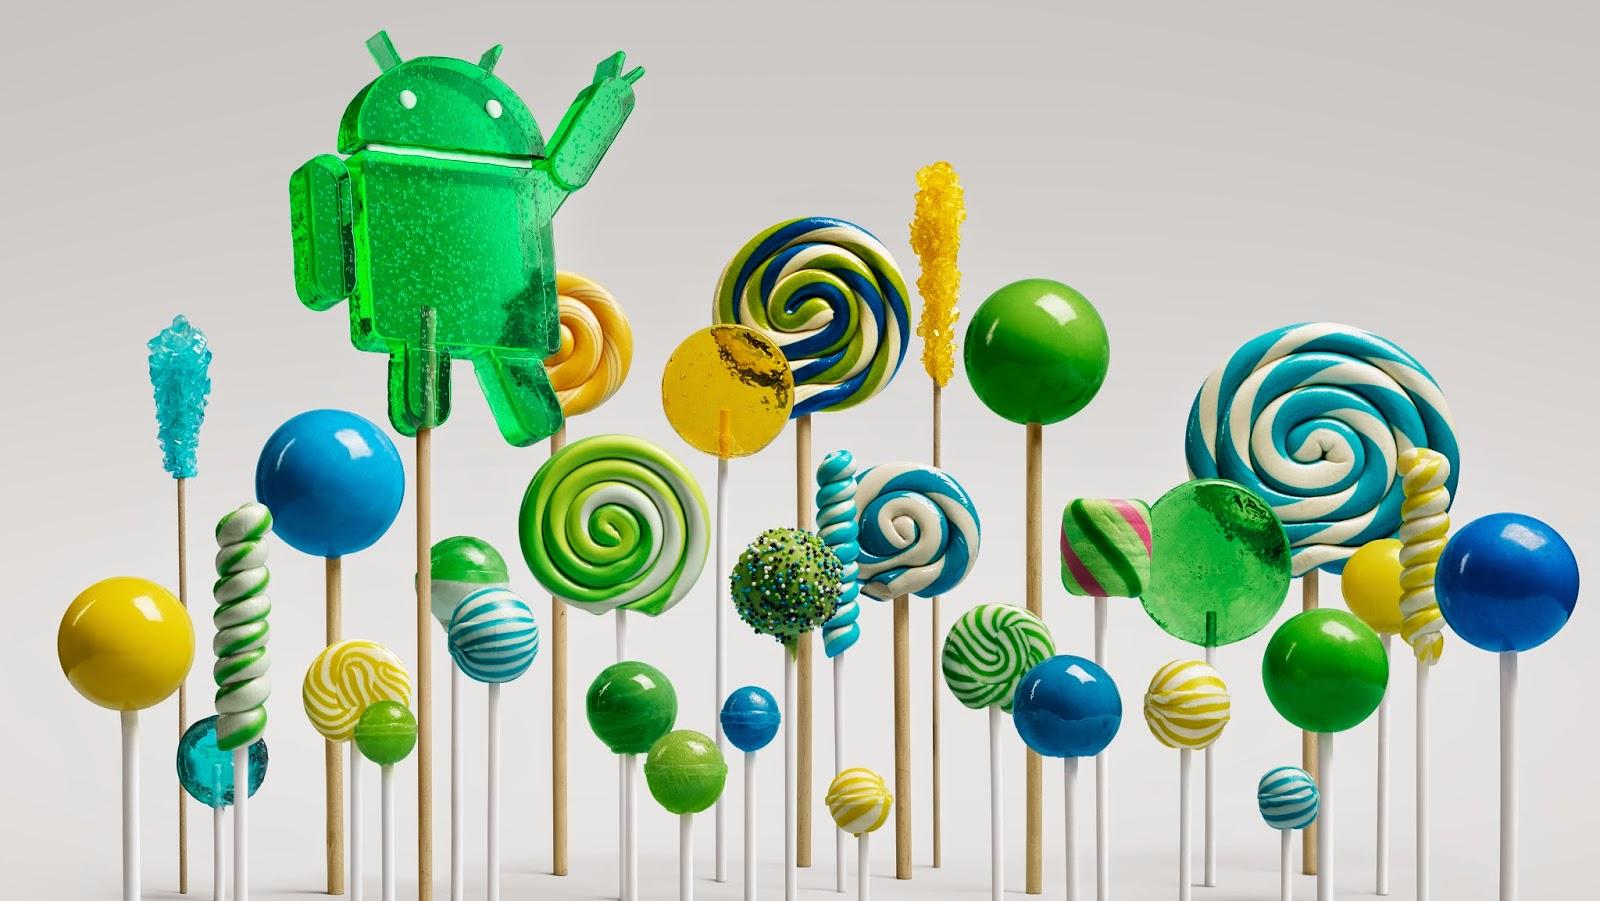 Google Android 5.0 si chiamerà Lollipop